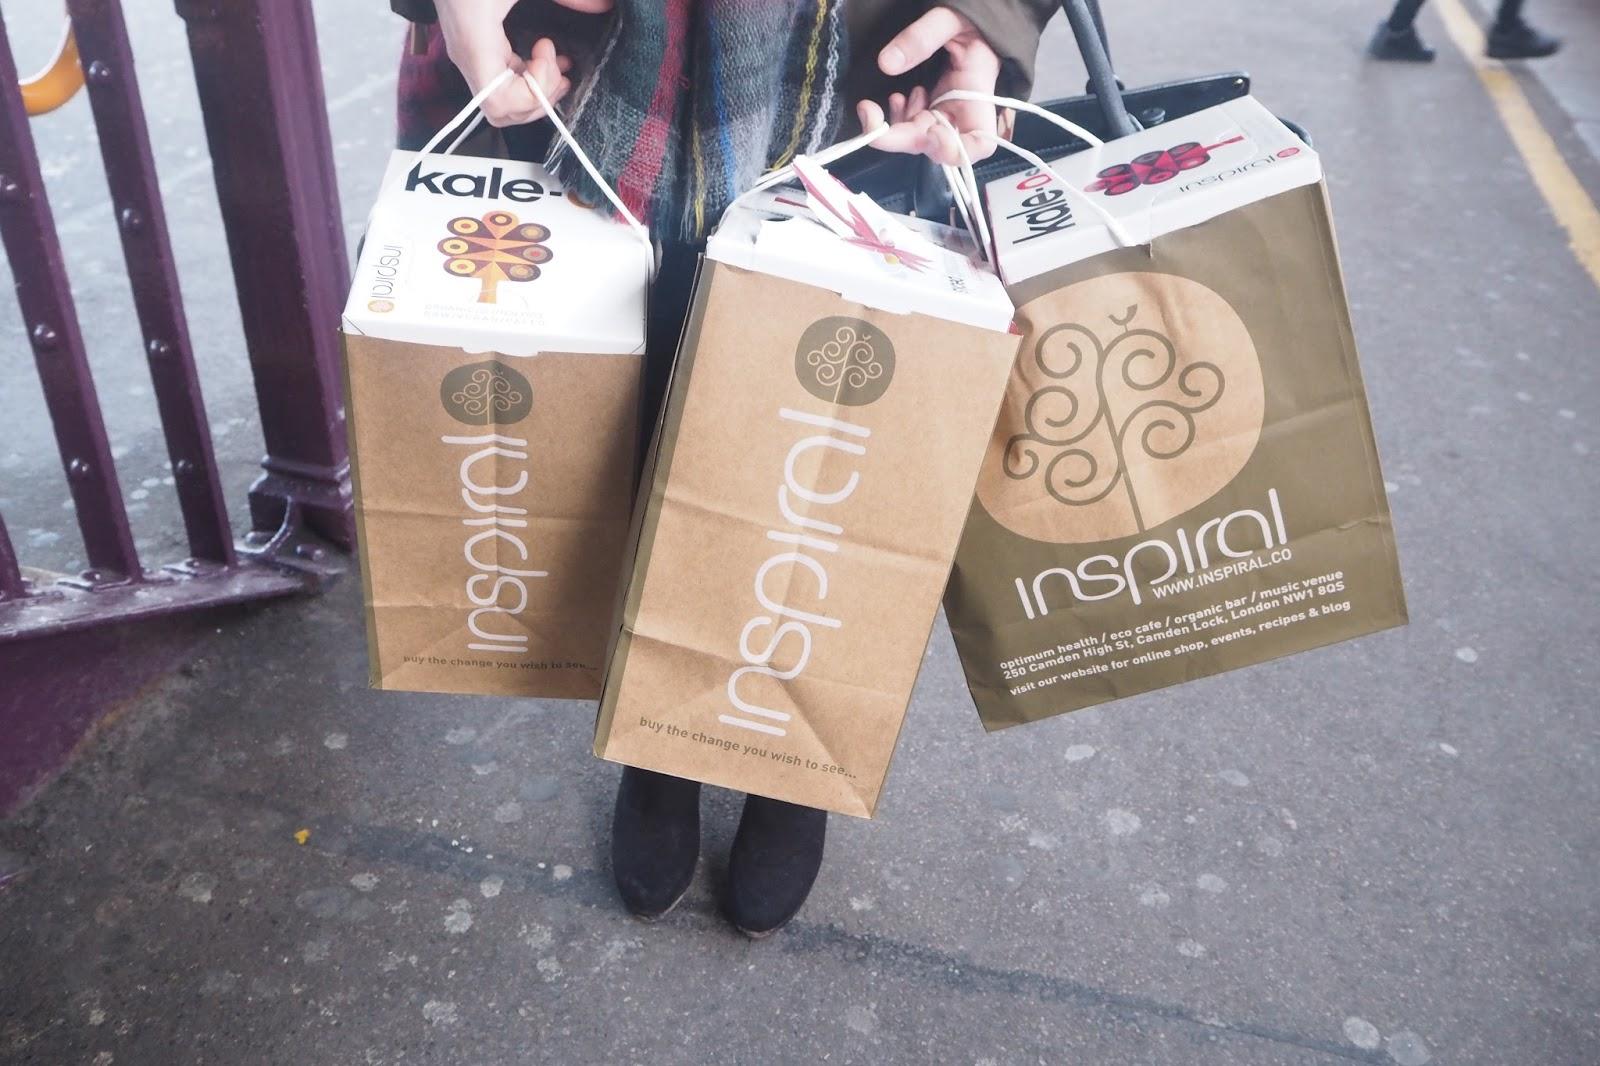 inspiralled-london-shopping-vegan-copper-garden